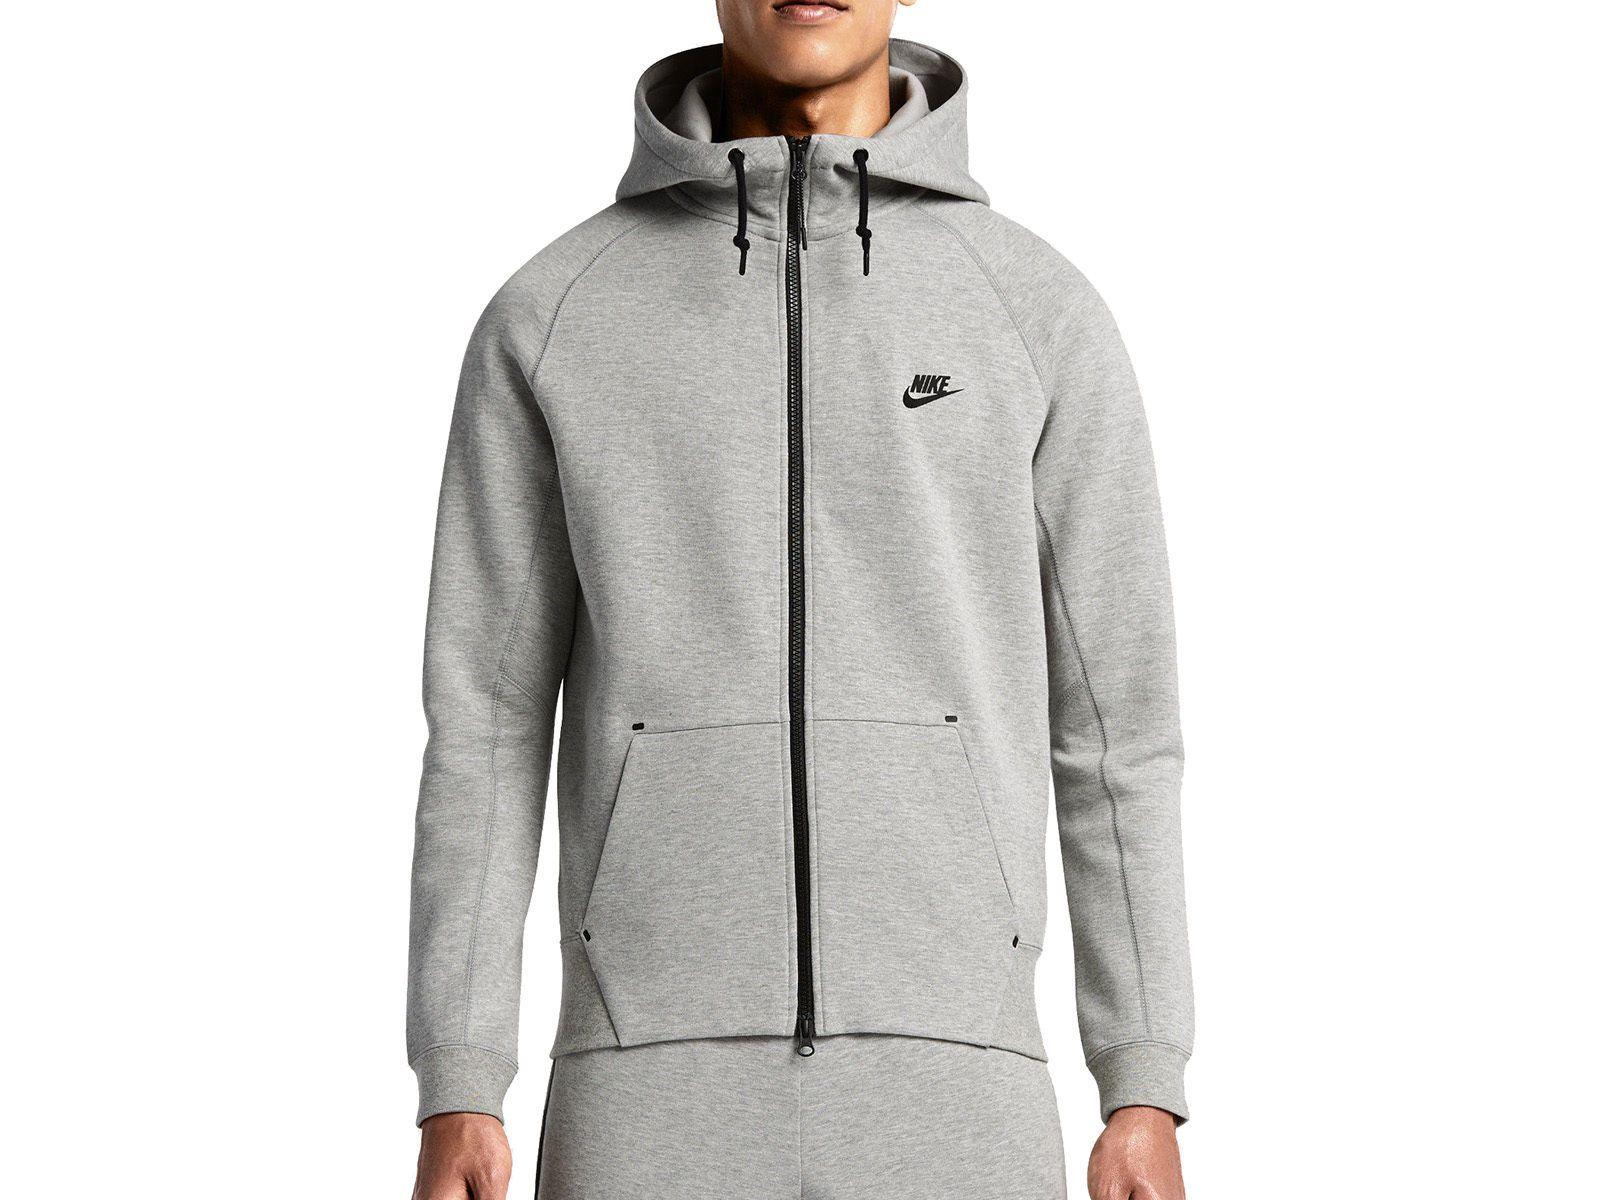 Football Fashion Nike tech fleece, Tech fleece, Hoodies men